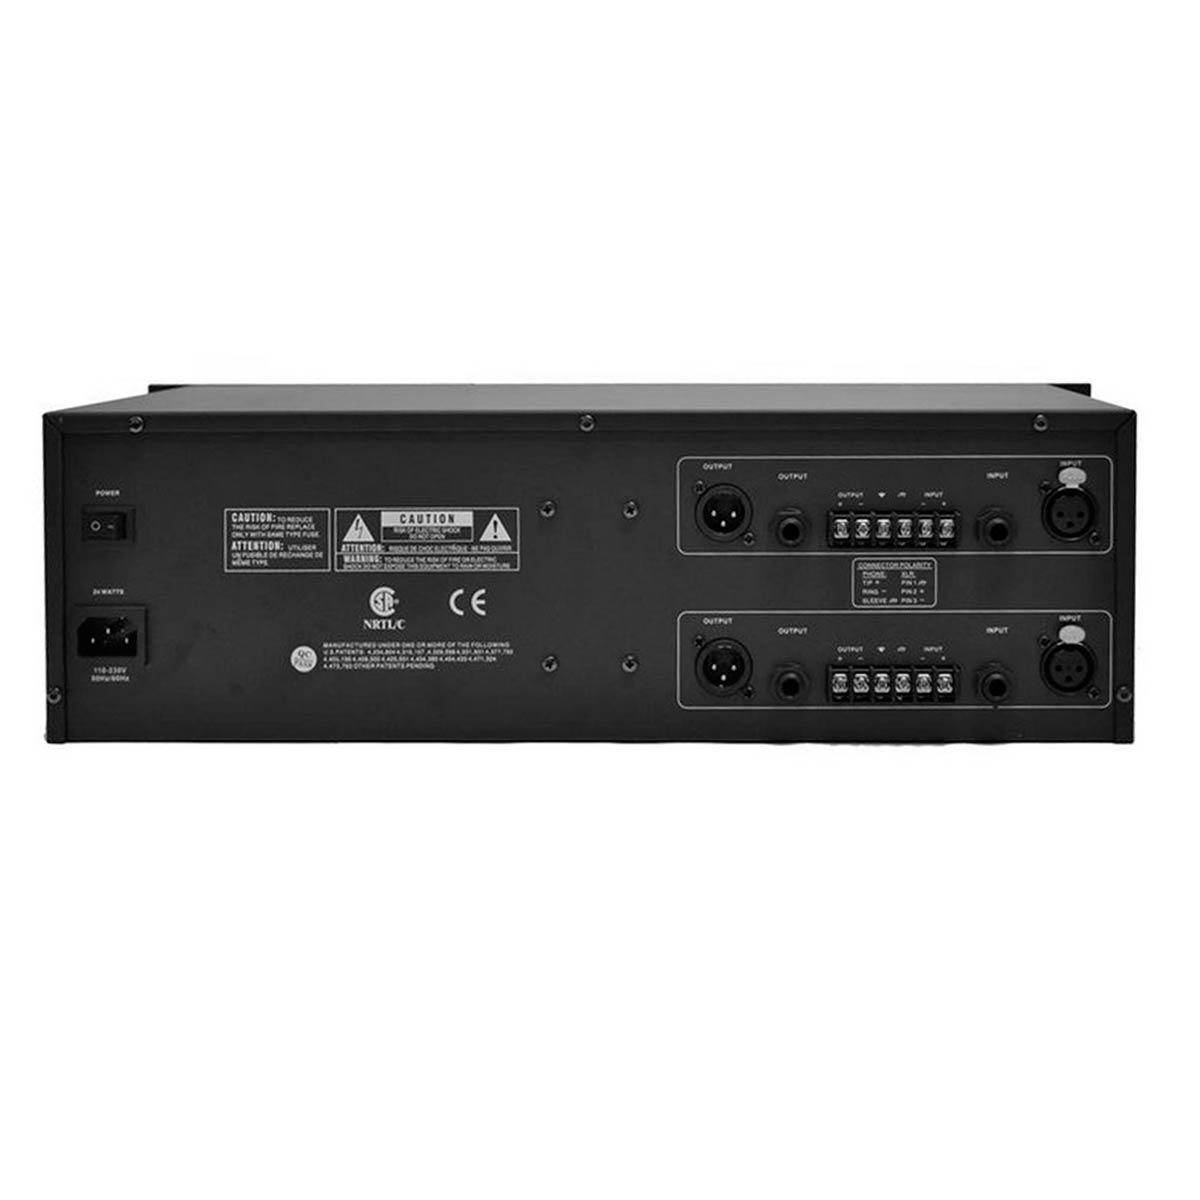 EQ2231 - Equalizador Gráfico 31 Bandas EQ 2231 - Leacs